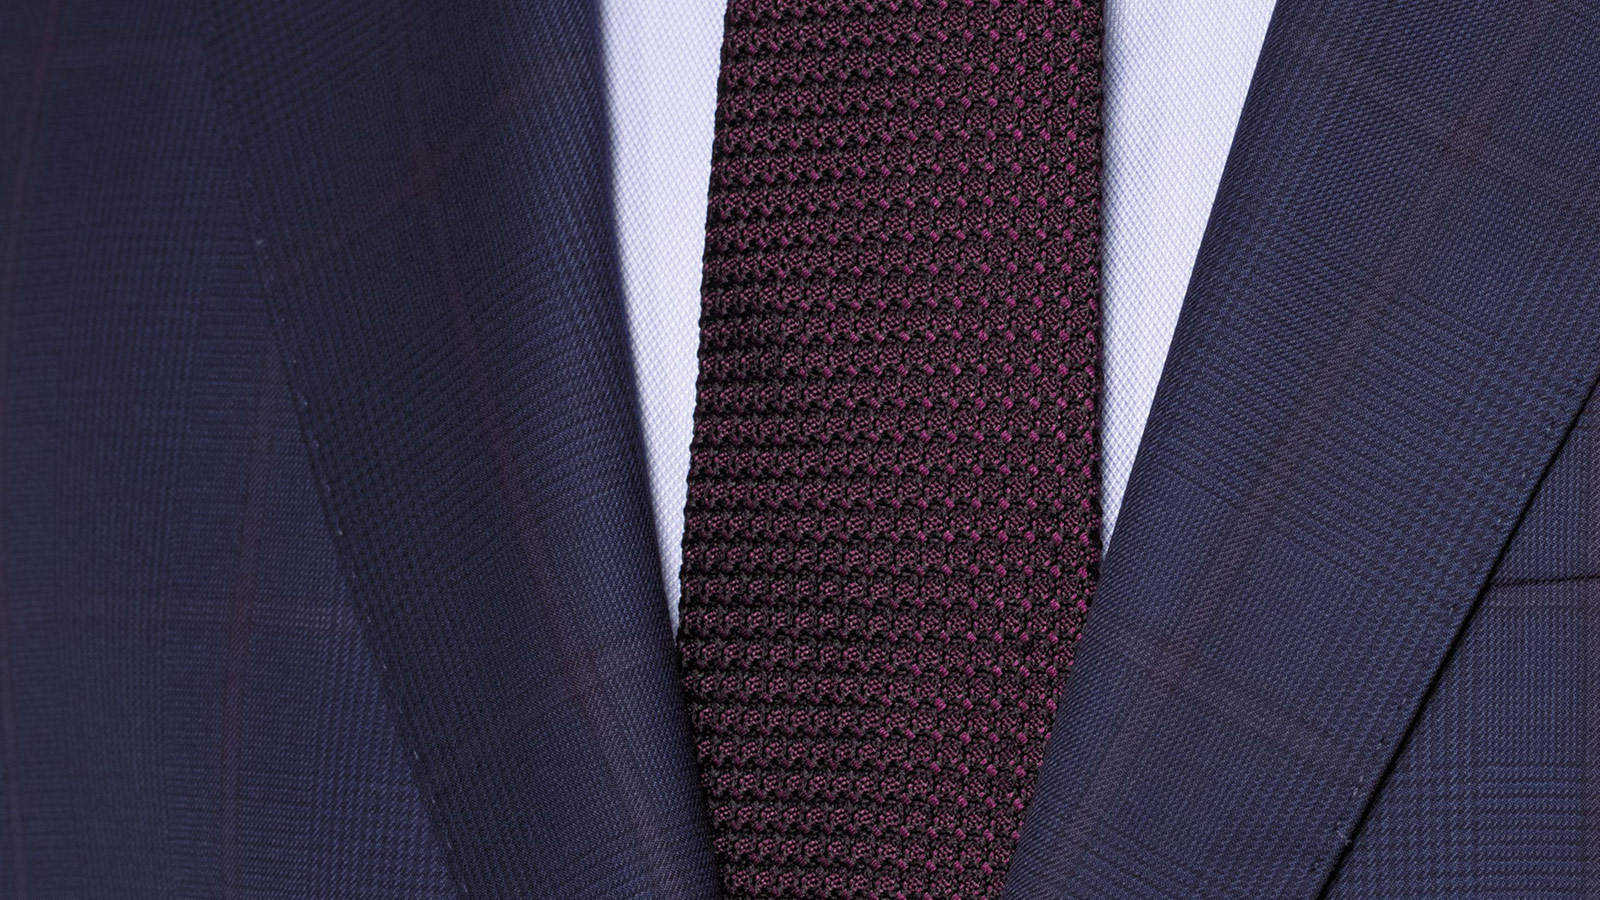 Vendetta Premium Lavender Check Navy Plaid Suit - slider image 1